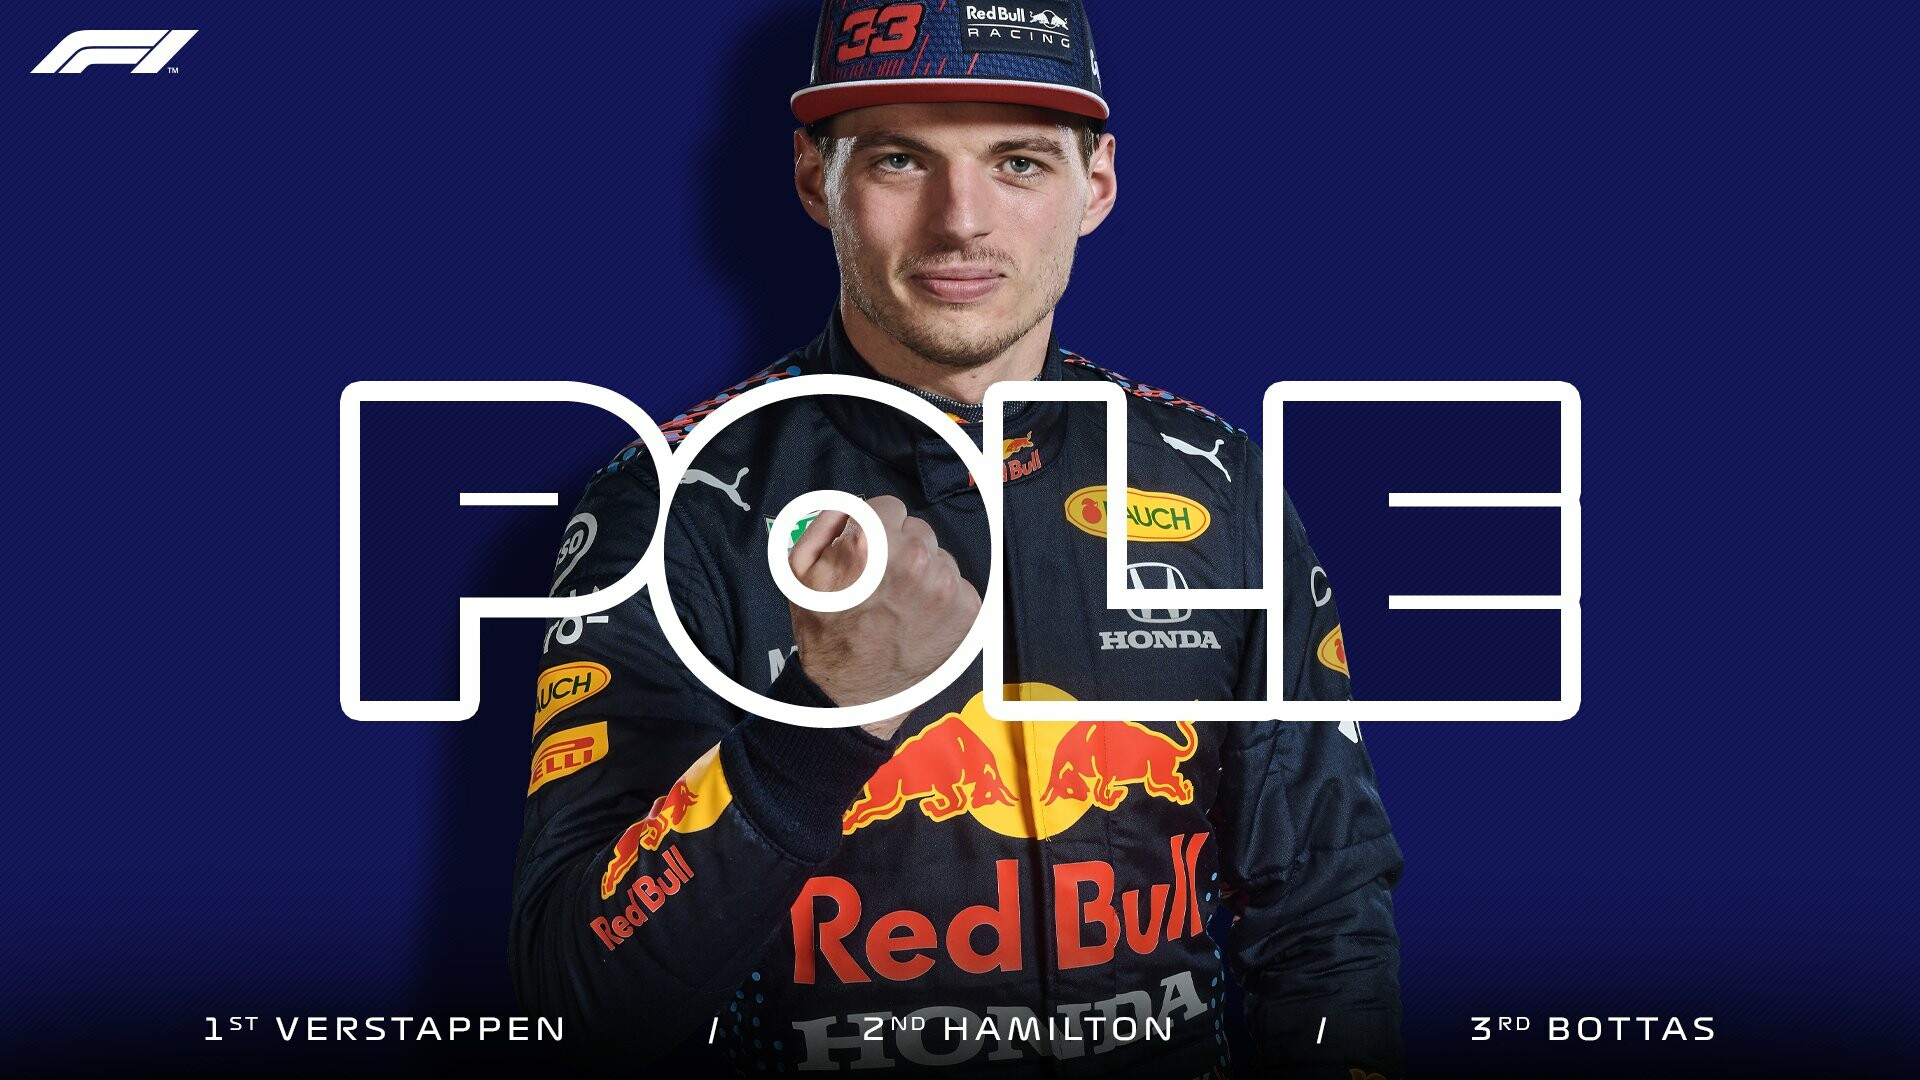 Шумахер – предпоследний, Ферстаппен – первый: старт Формулы-1